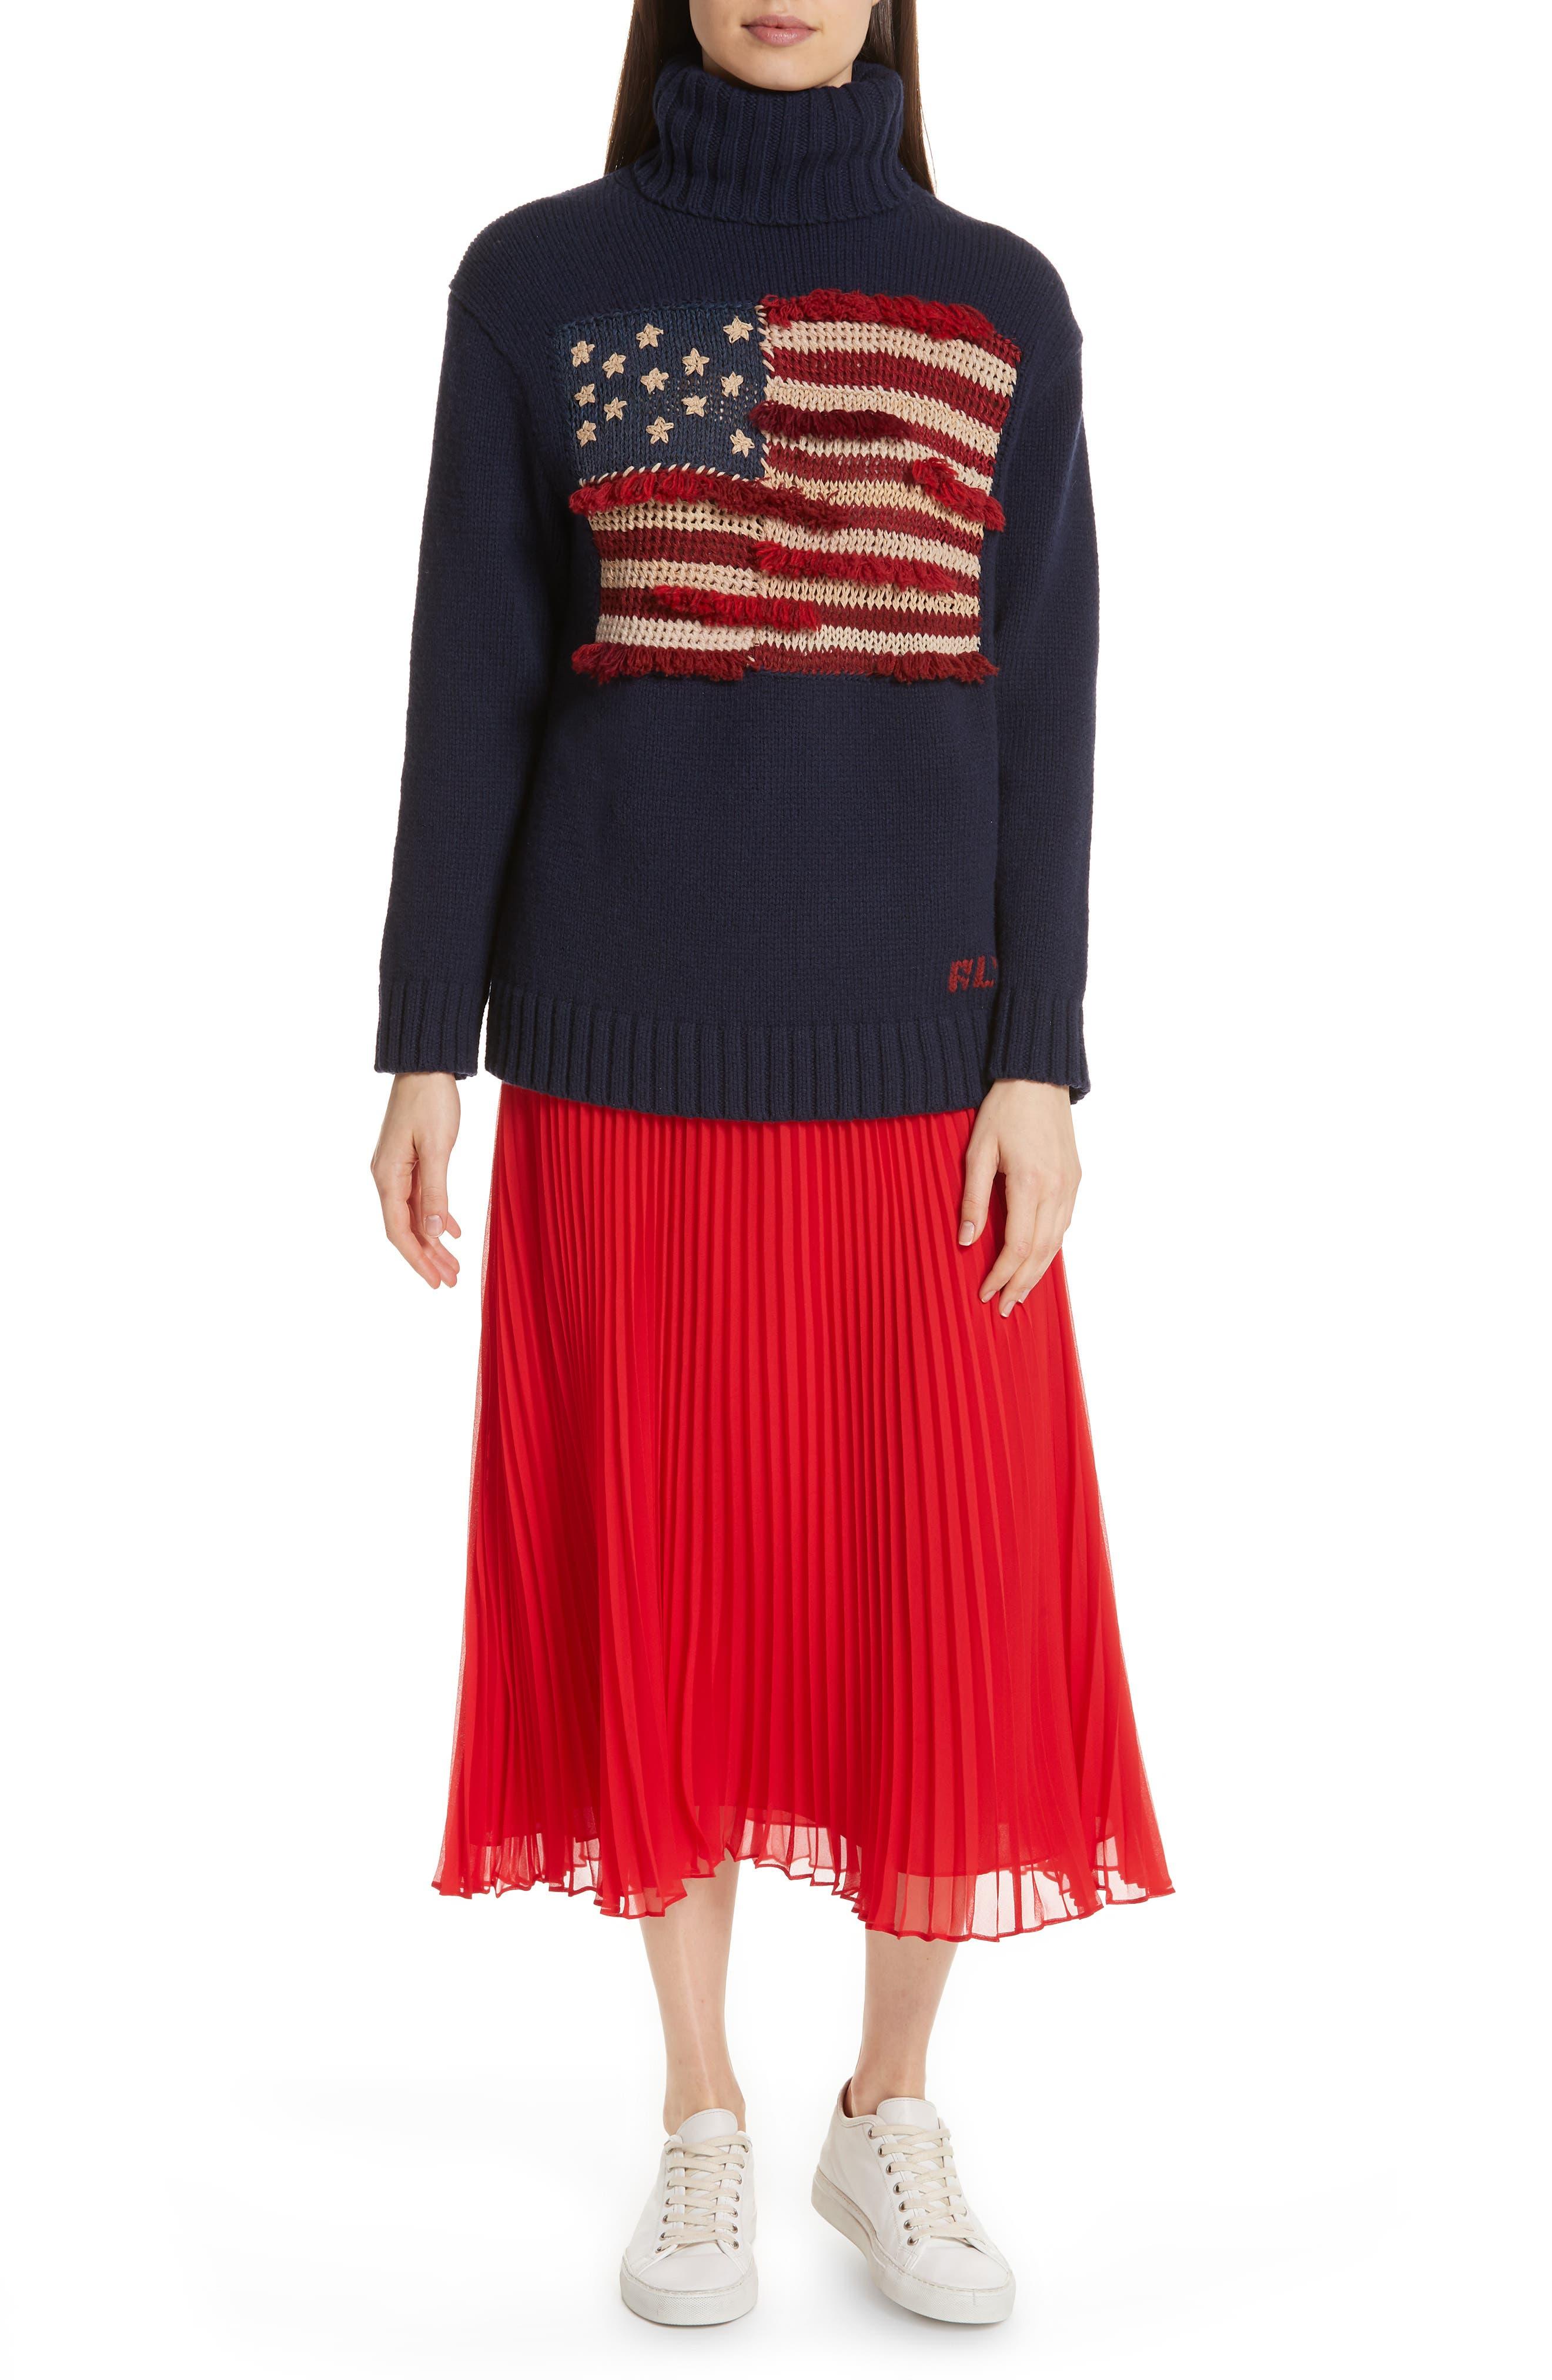 POLO RALPH LAUREN, Pleat Midi Skirt, Alternate thumbnail 7, color, PANDORA RED